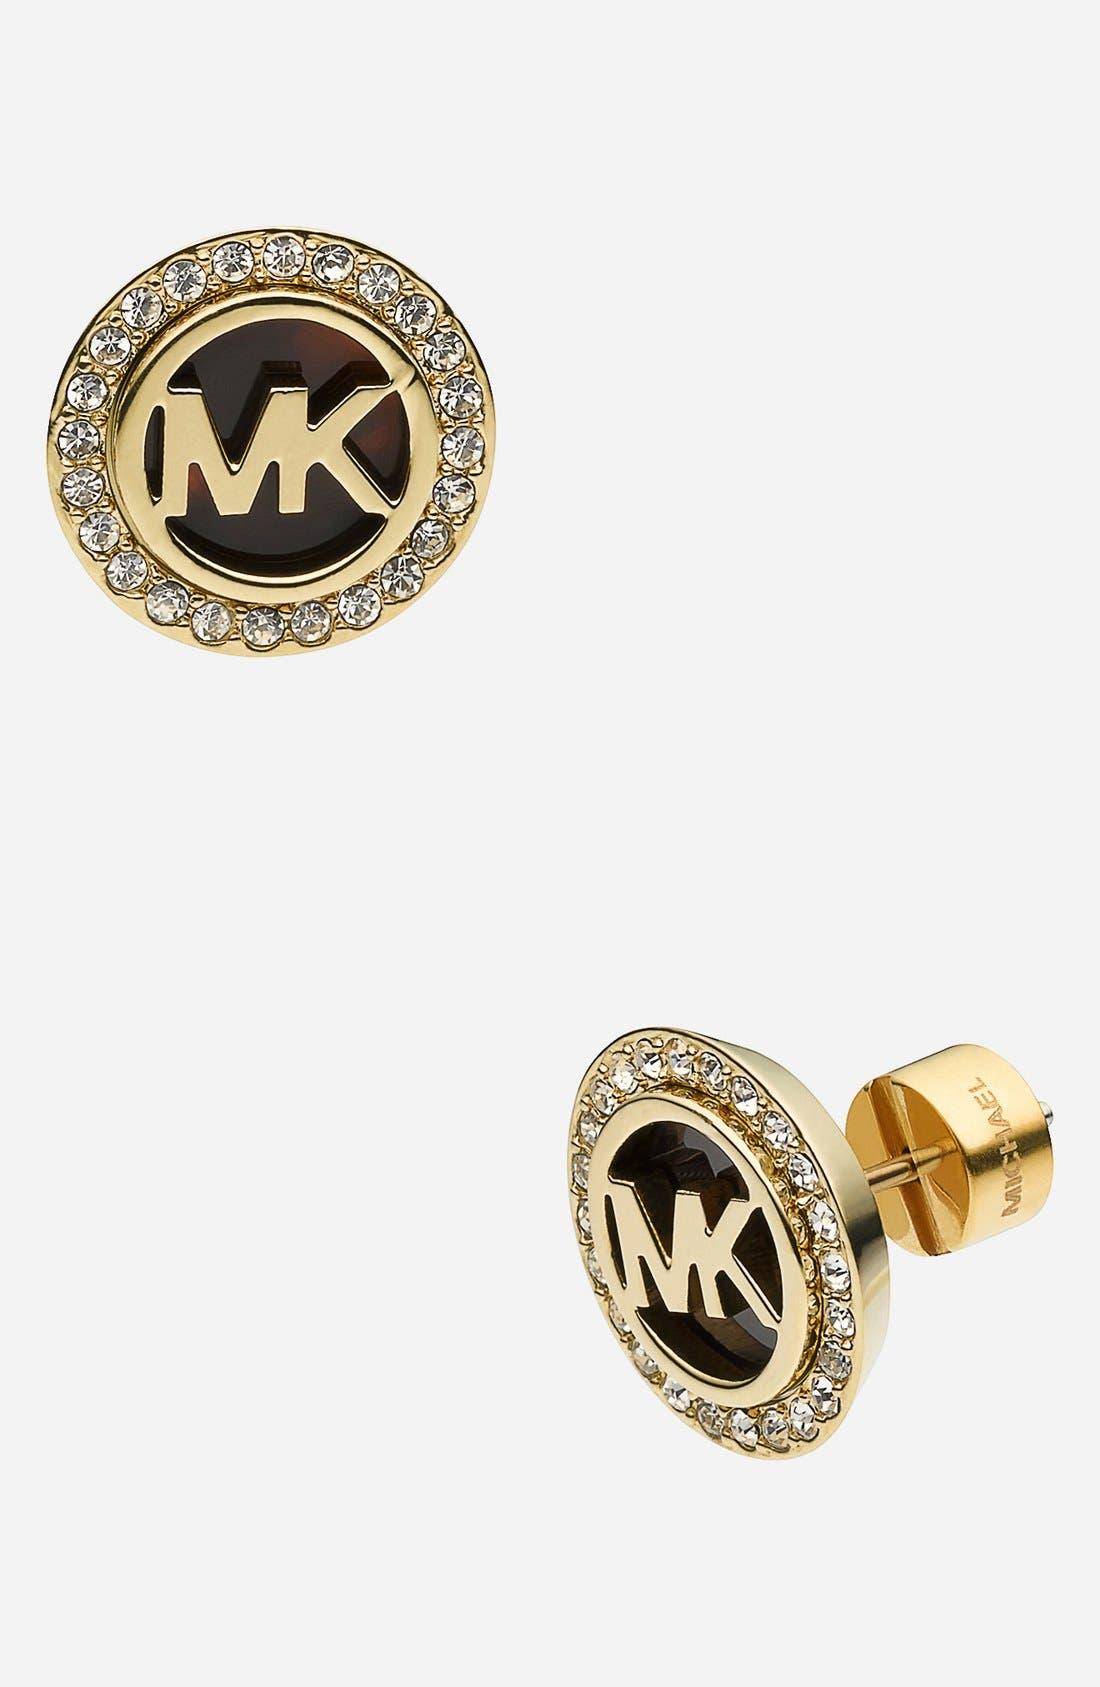 Main Image - Michael Kors 'Monogram' Stud Earrings